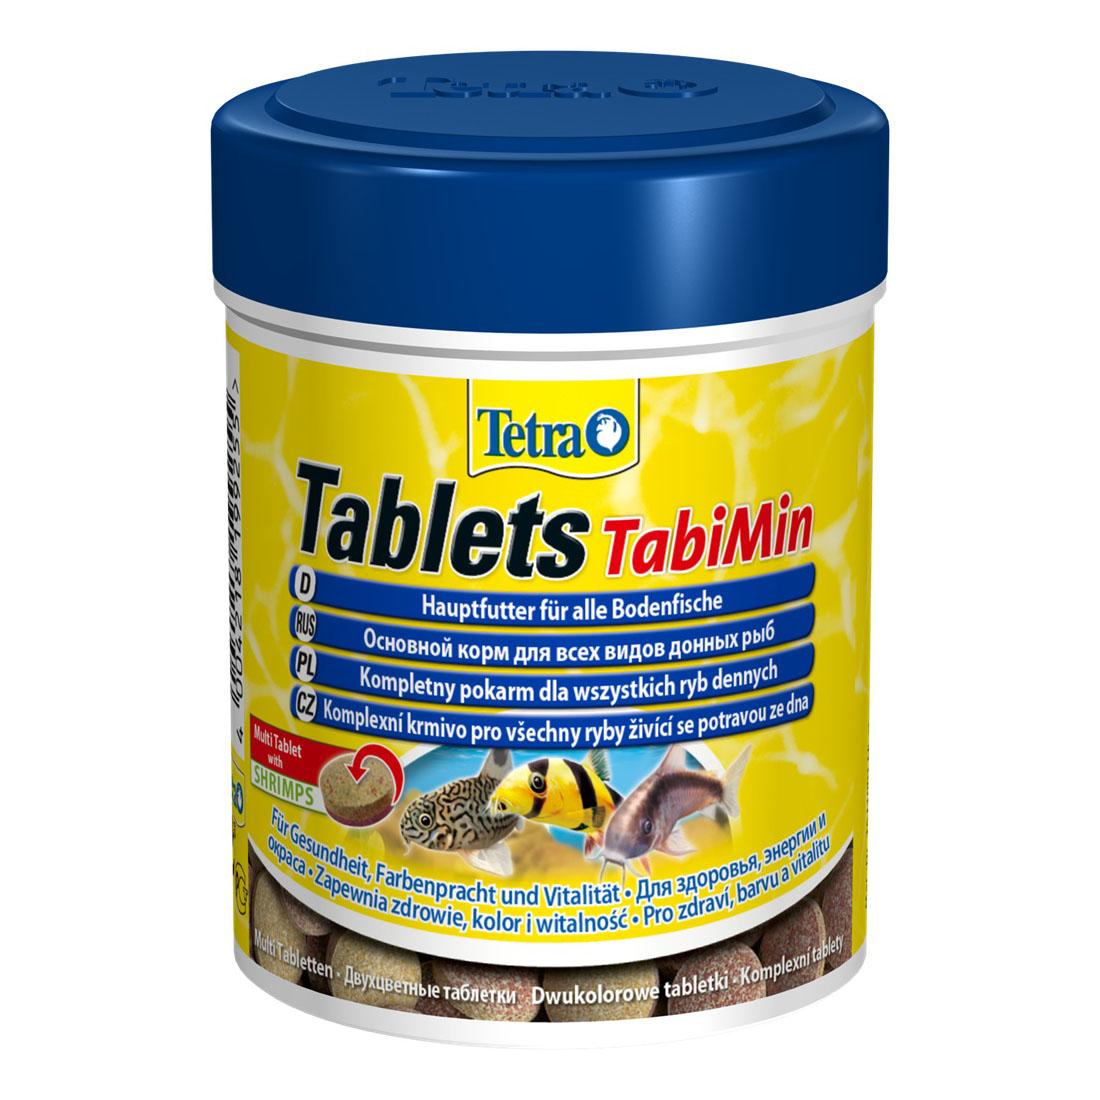 Сухой корм для аквариумных рыб Tetra в таблетках «Tablets TabiMin» 275 шт. (для донных рыб)